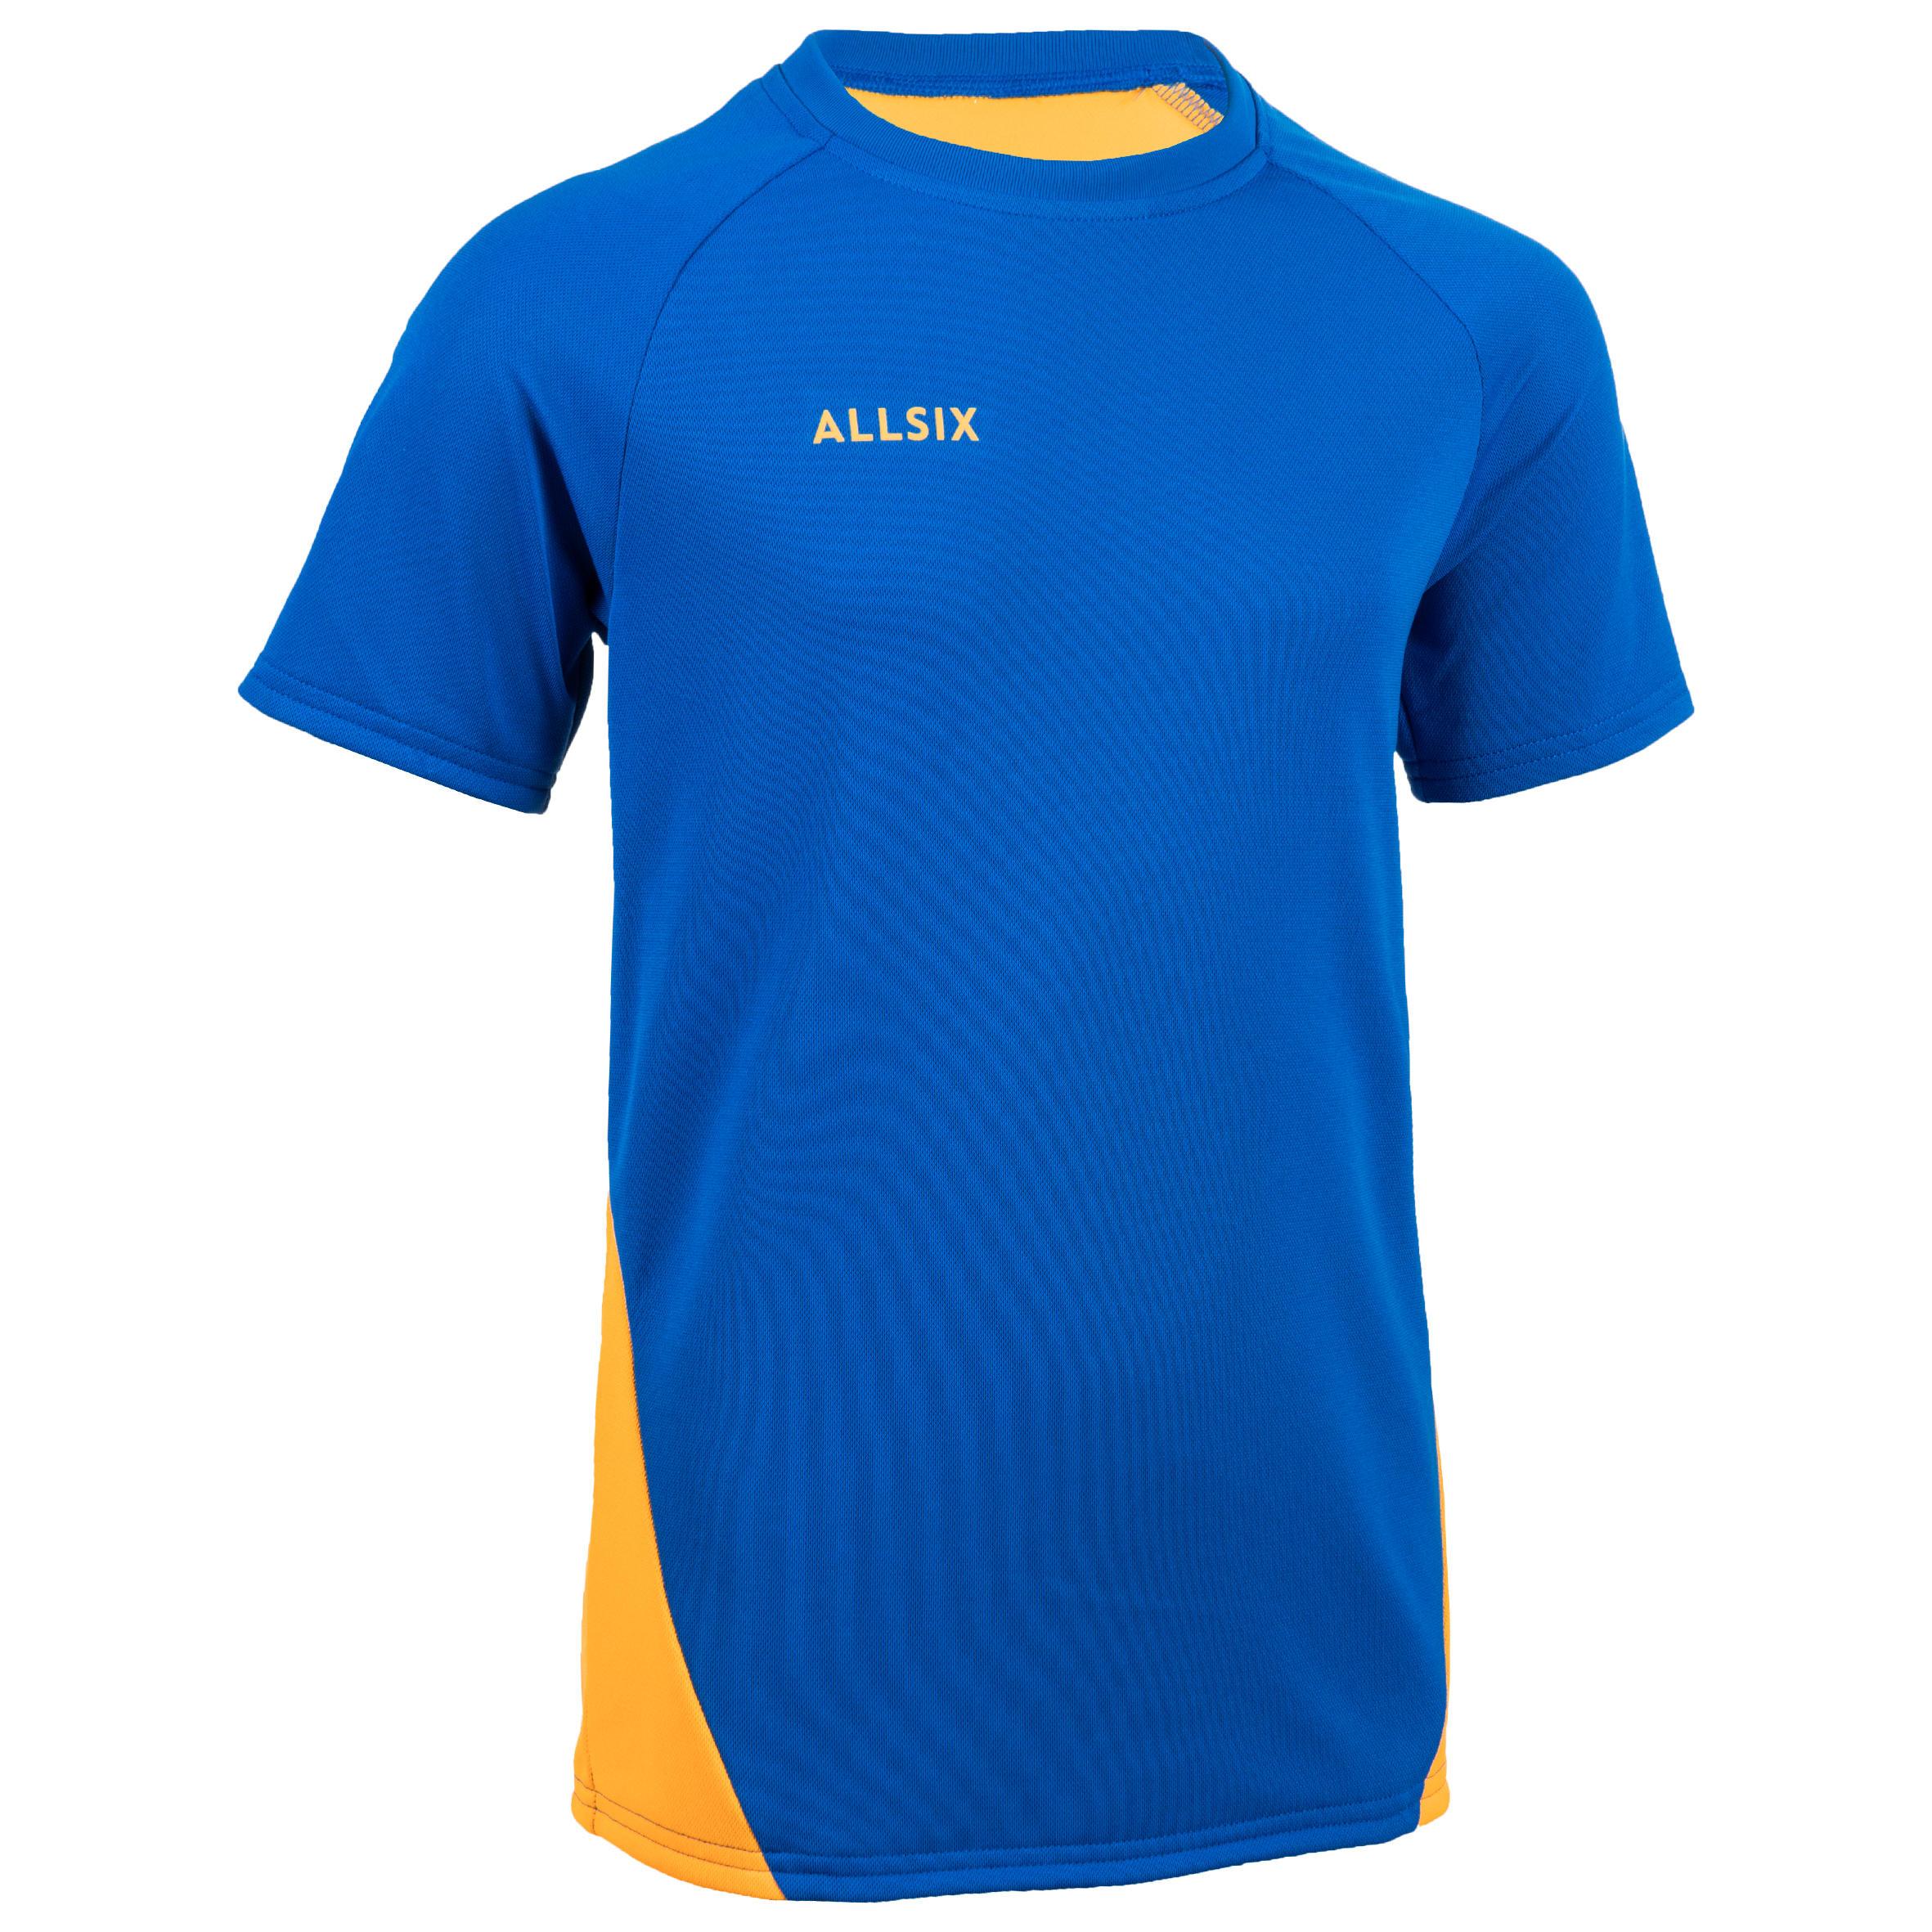 Allsix Volleybalshirt jongens V100 blauw/geel